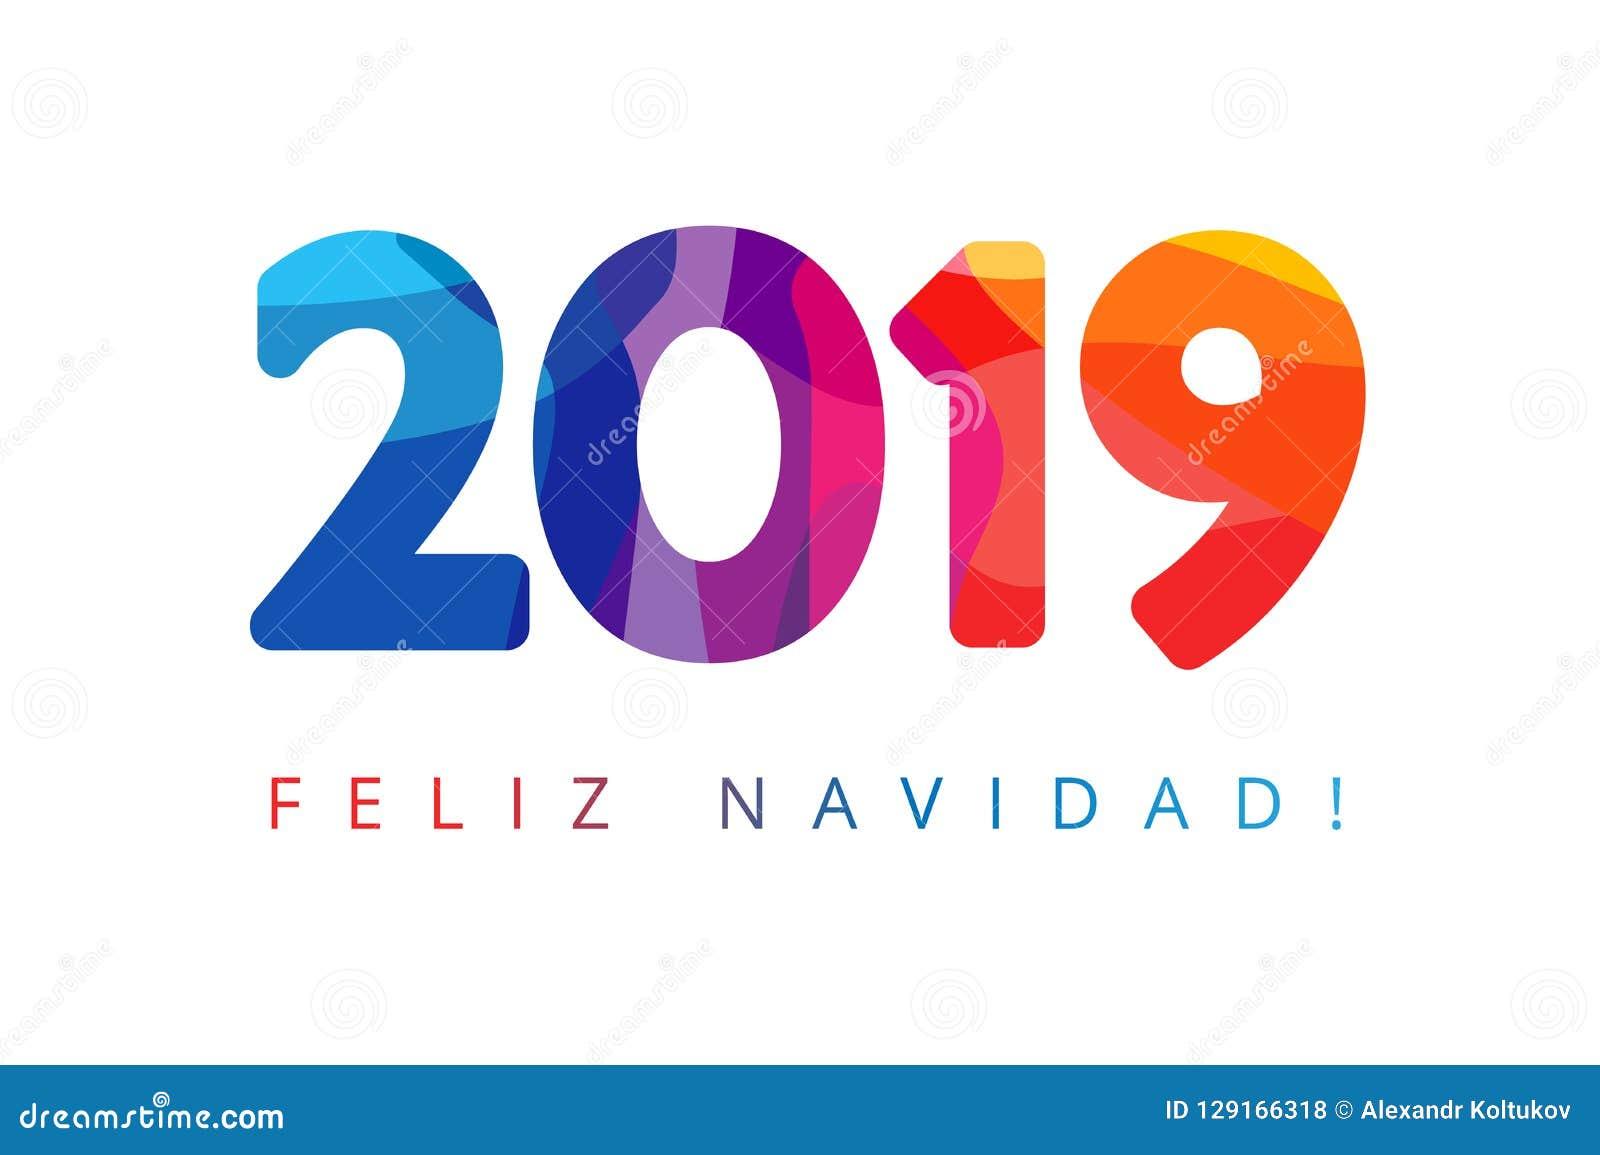 2019 feliz navidad xmas spanish greetings translate merry christmas